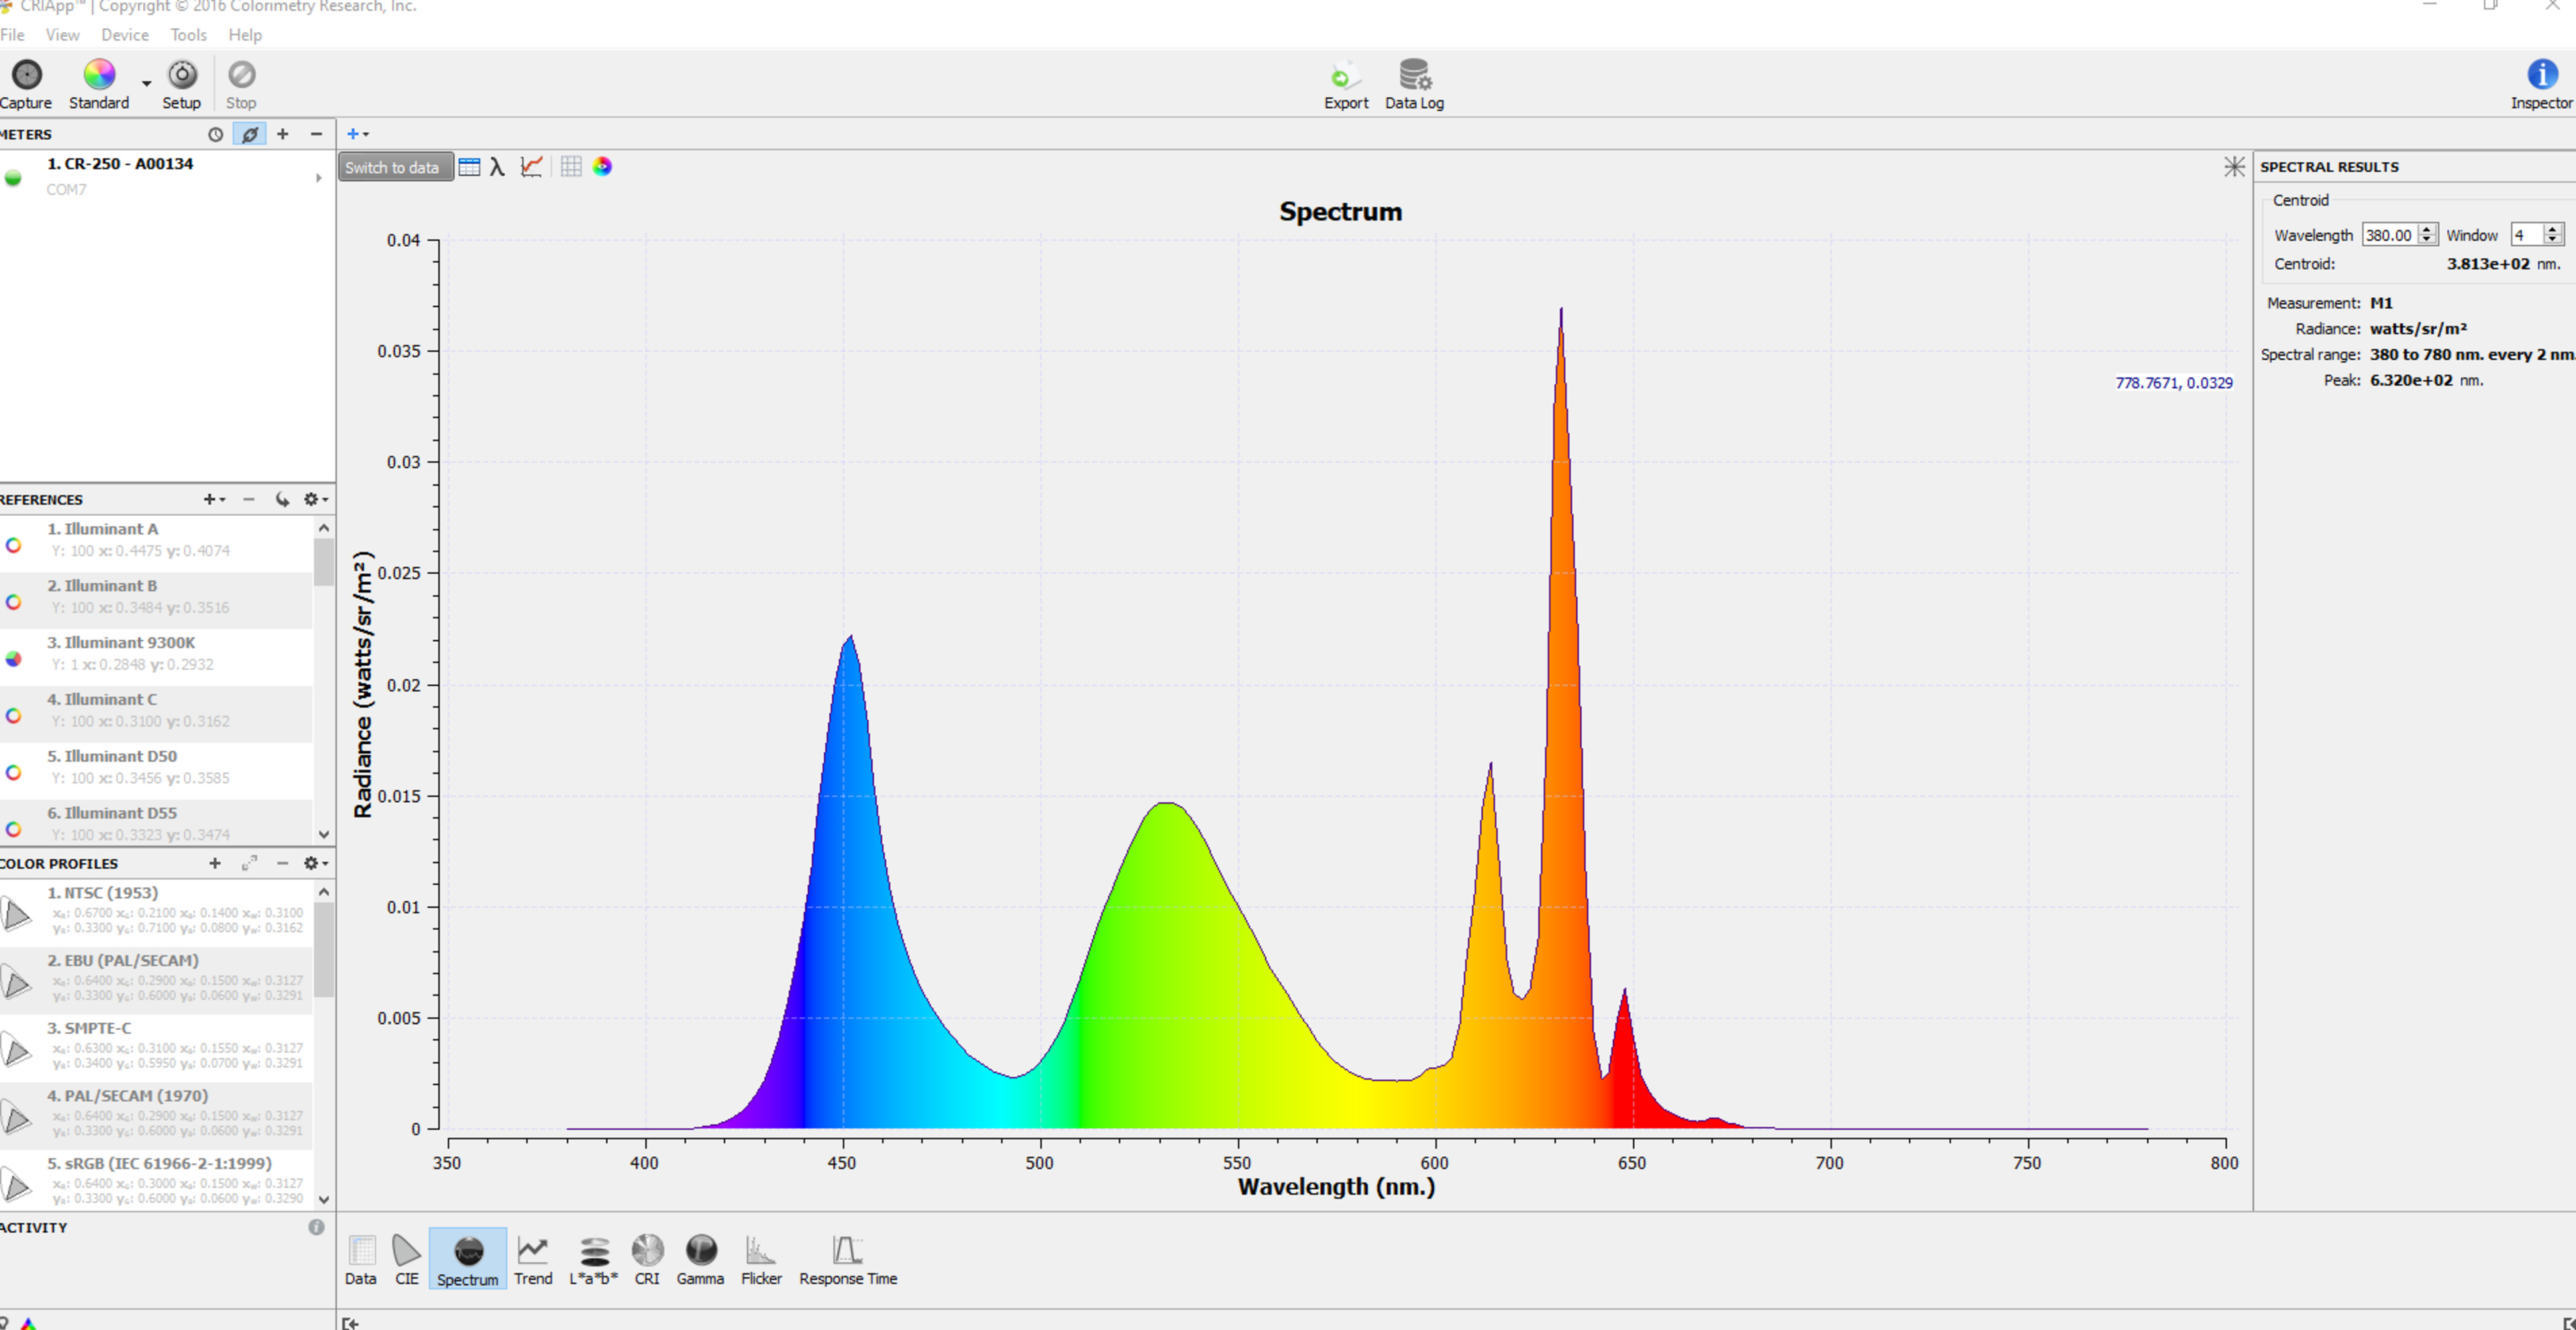 spectrum-large.jpg